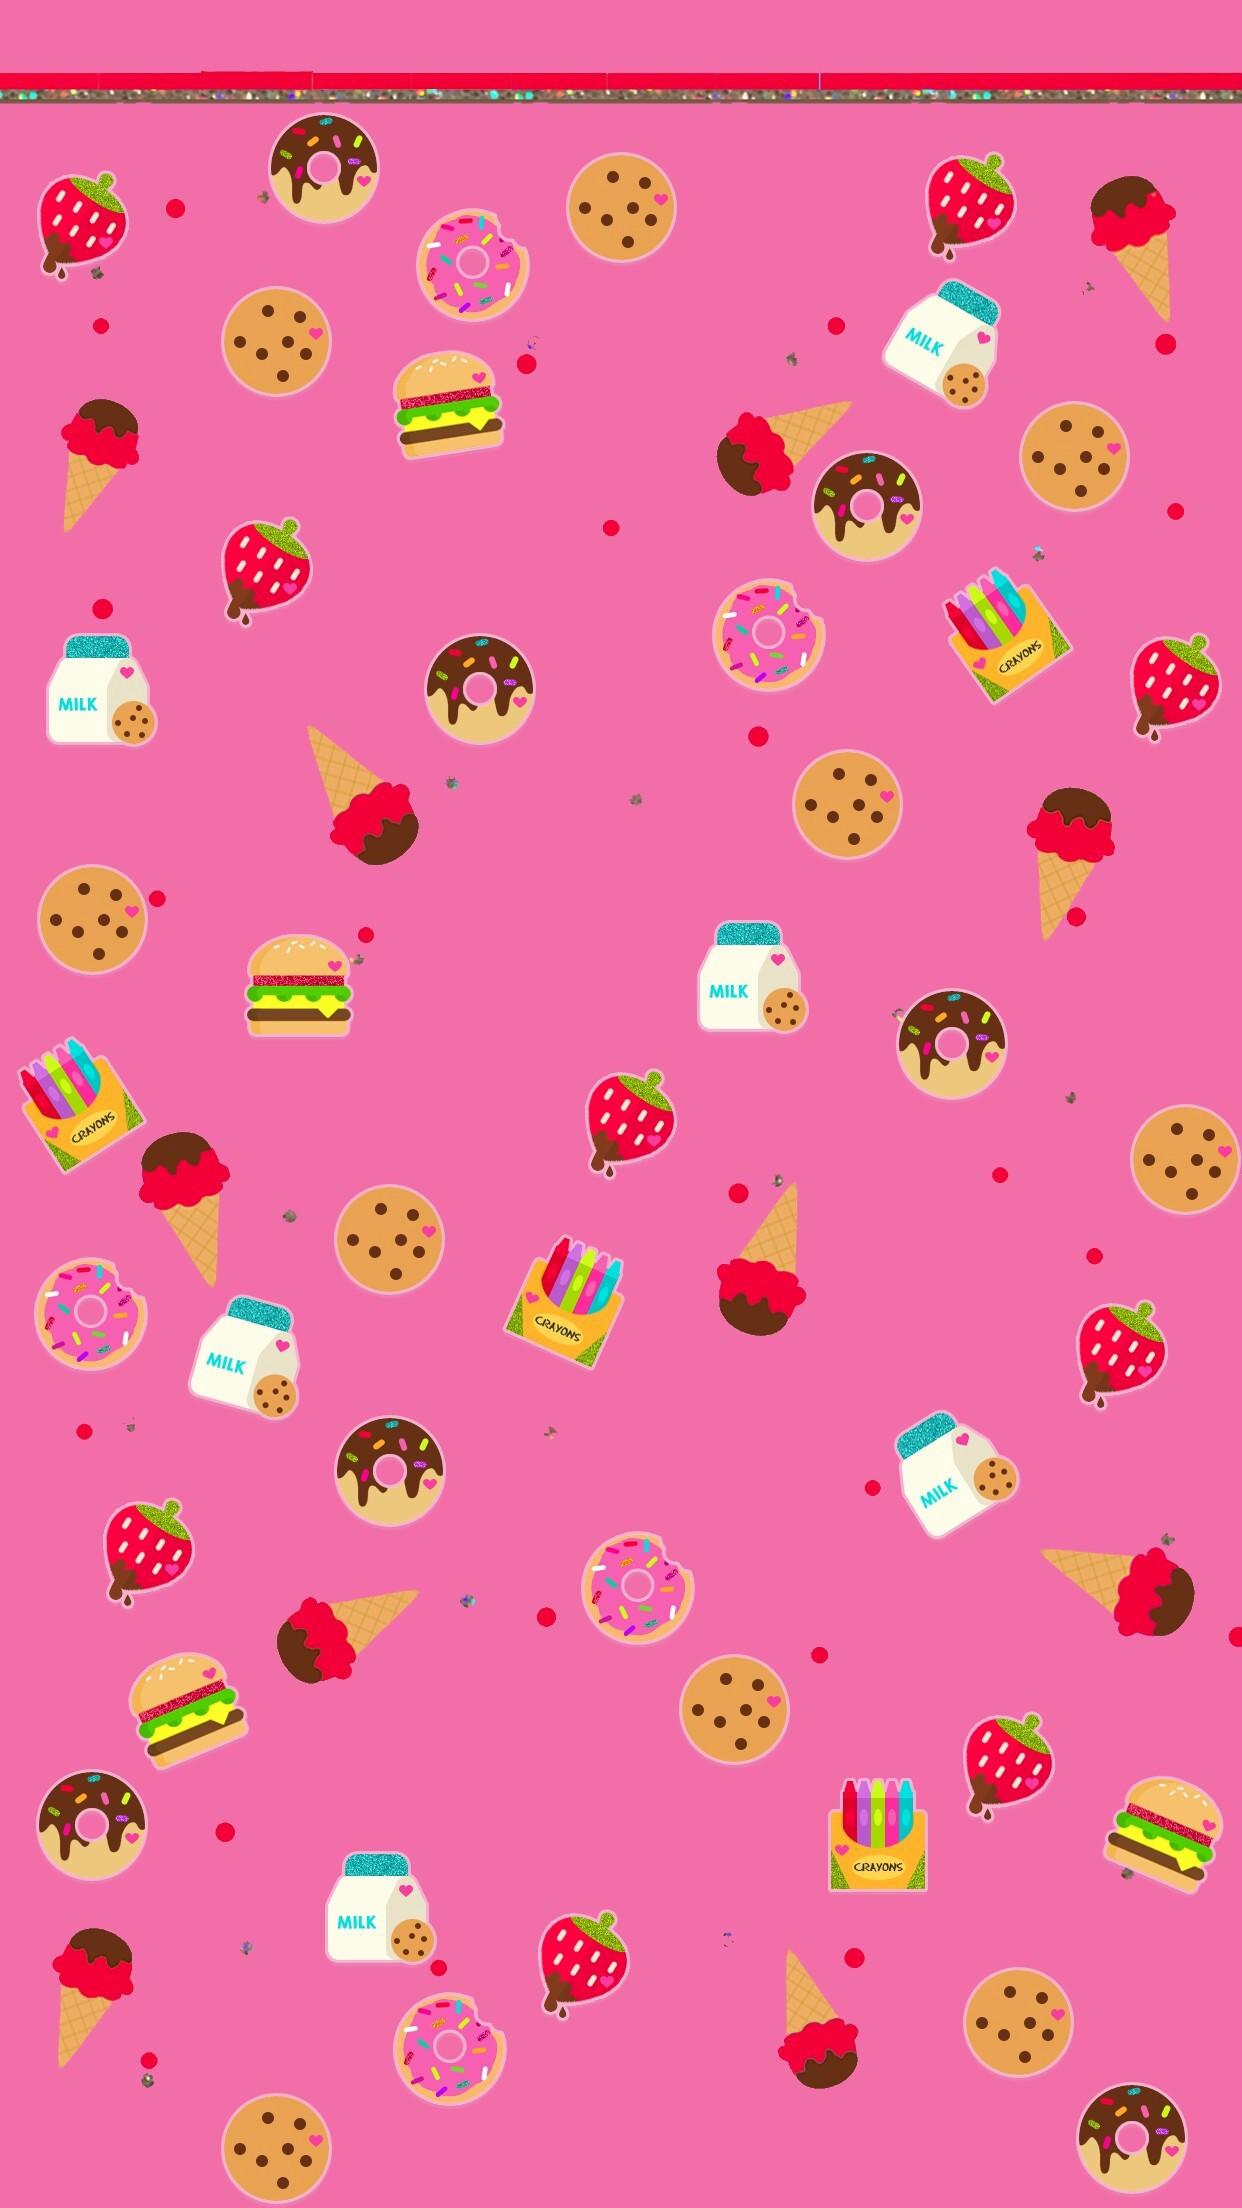 5 55747 1242x2208 phones wallpaper cute girly beautiful for iphone